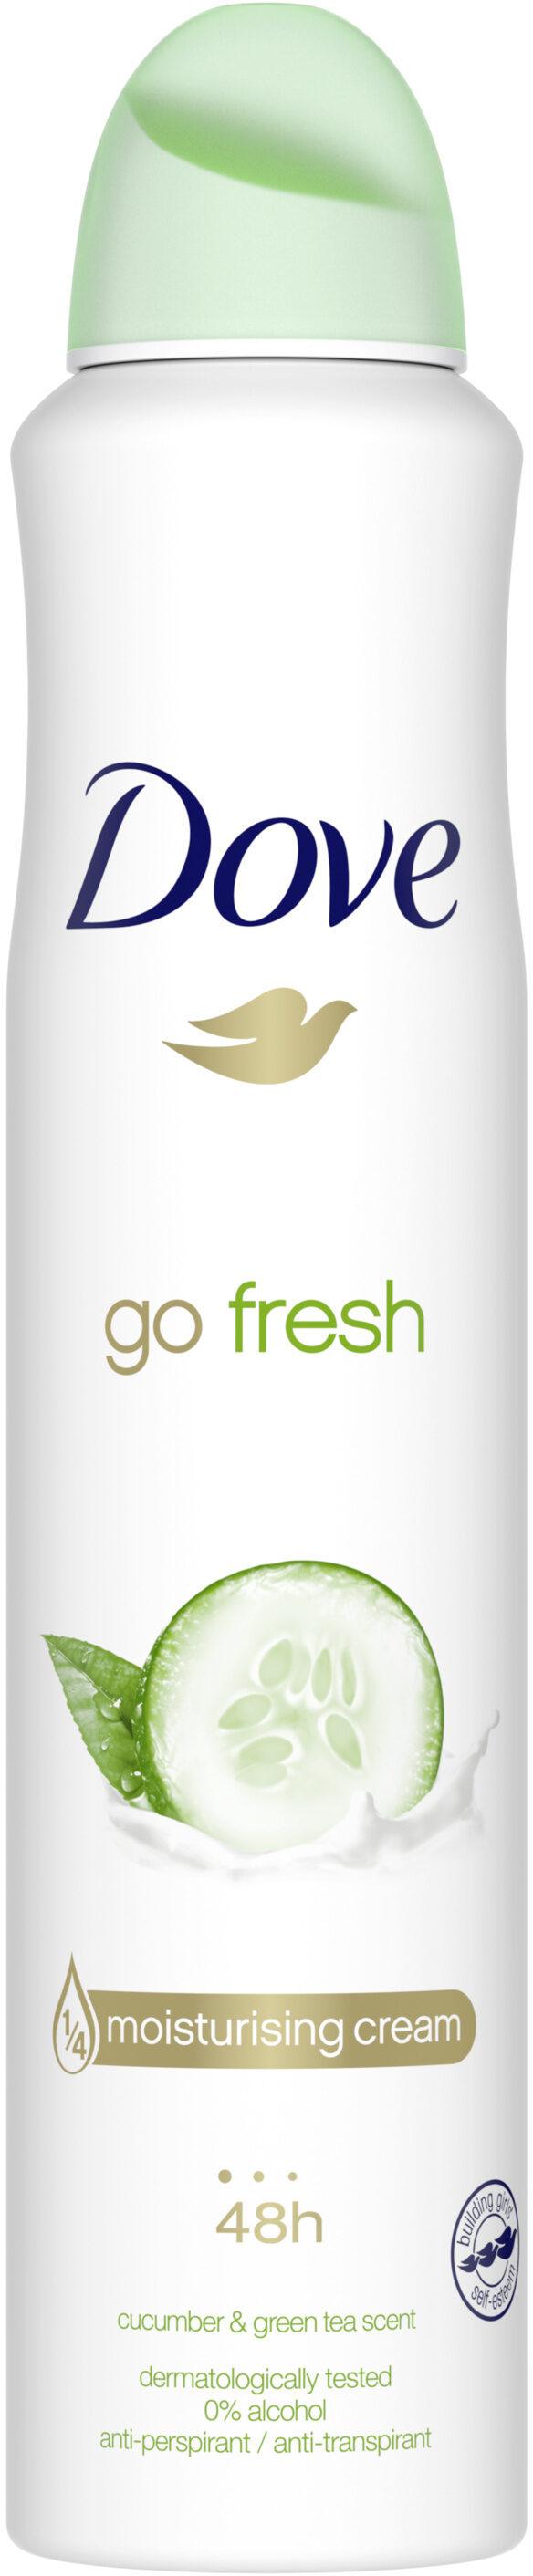 Dove Déodorant Femme Spray Anti Transpirant Go Fresh Concombre - Produit - fr